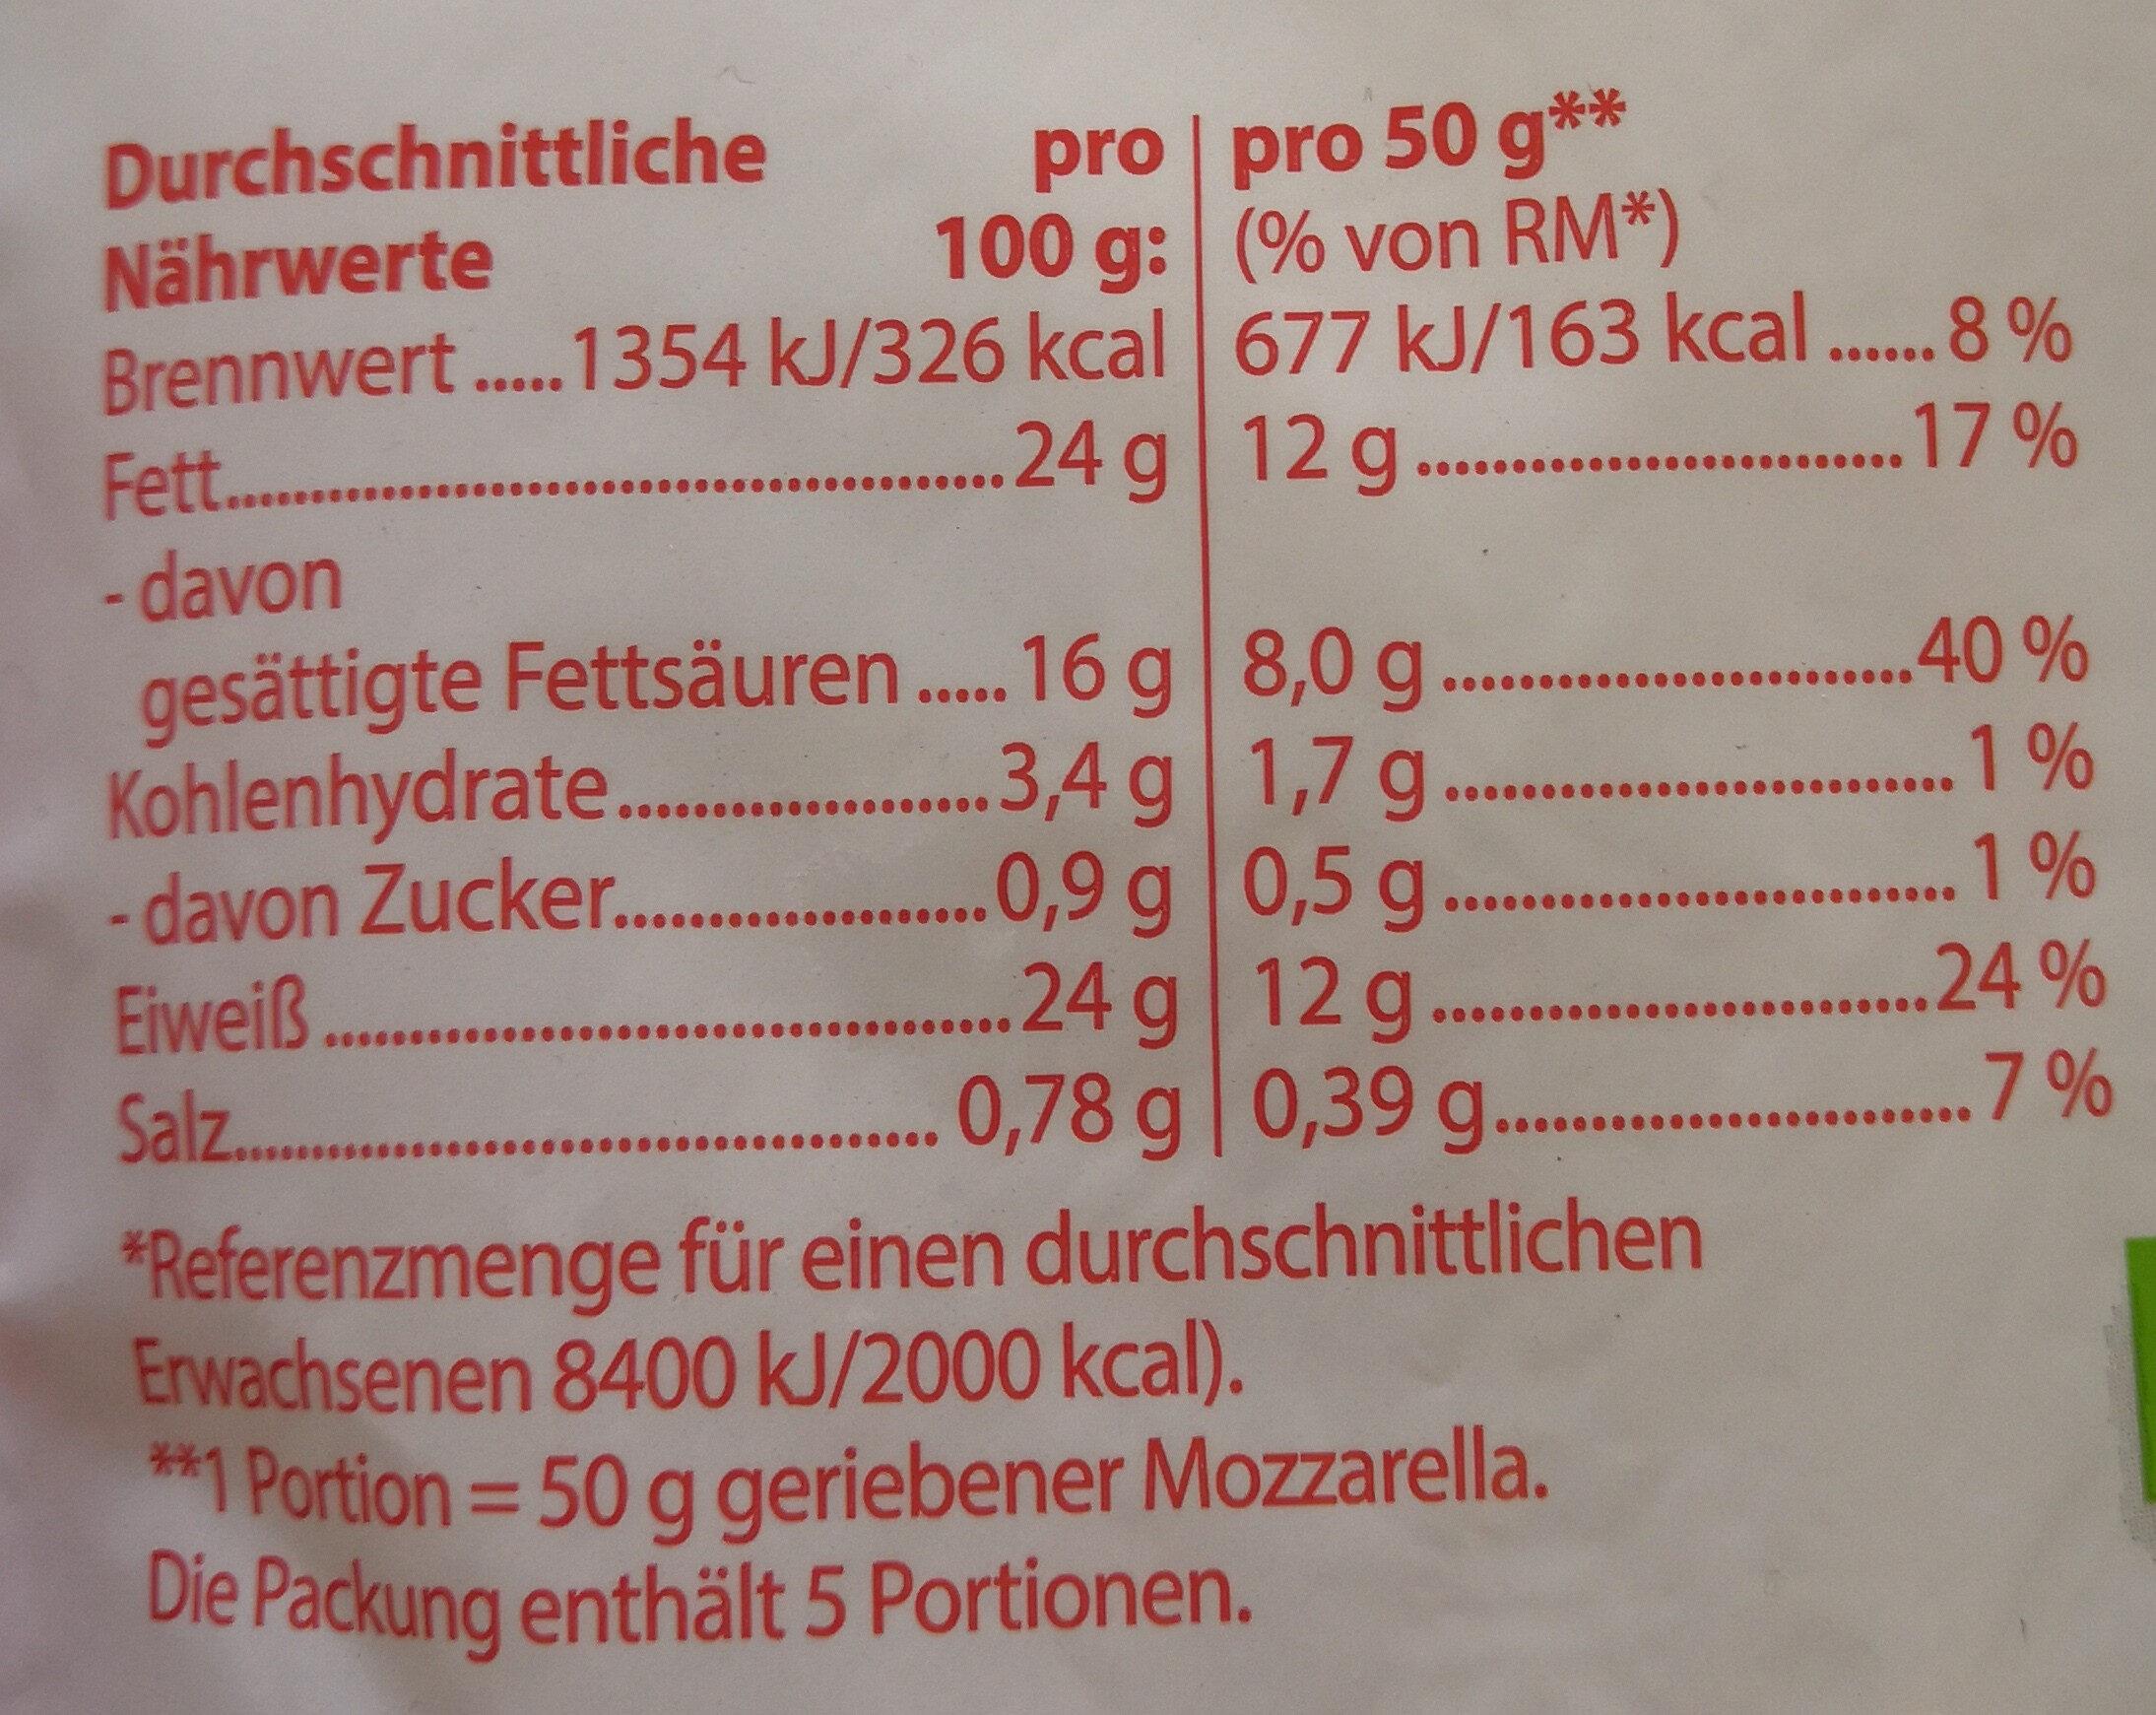 frija Mozzarella, gerieben - Nährwertangaben - de